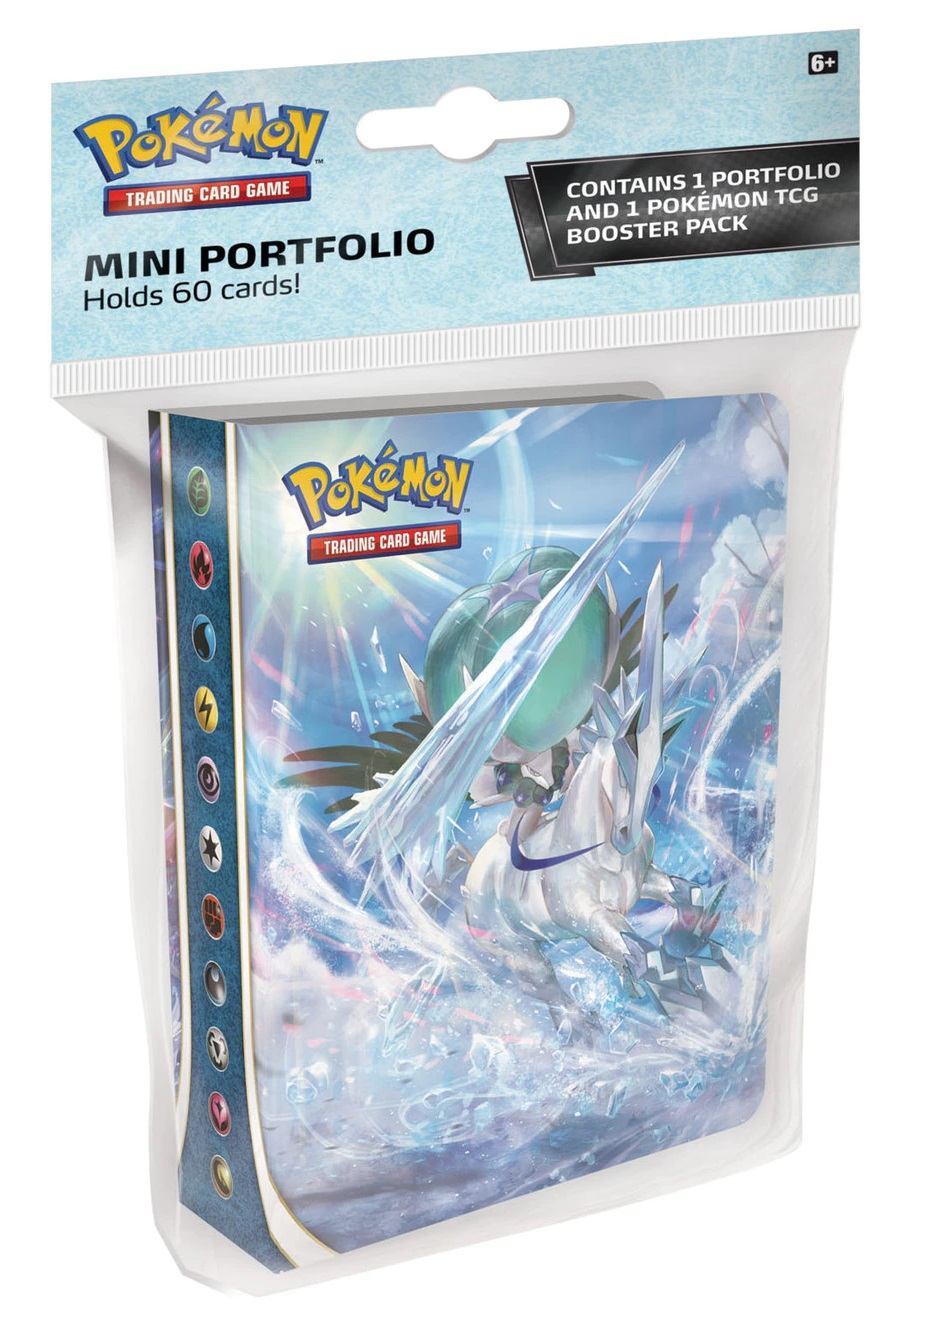 Pokemon - Sword & Shield: Chilling Reign Mini Portfolio (60)